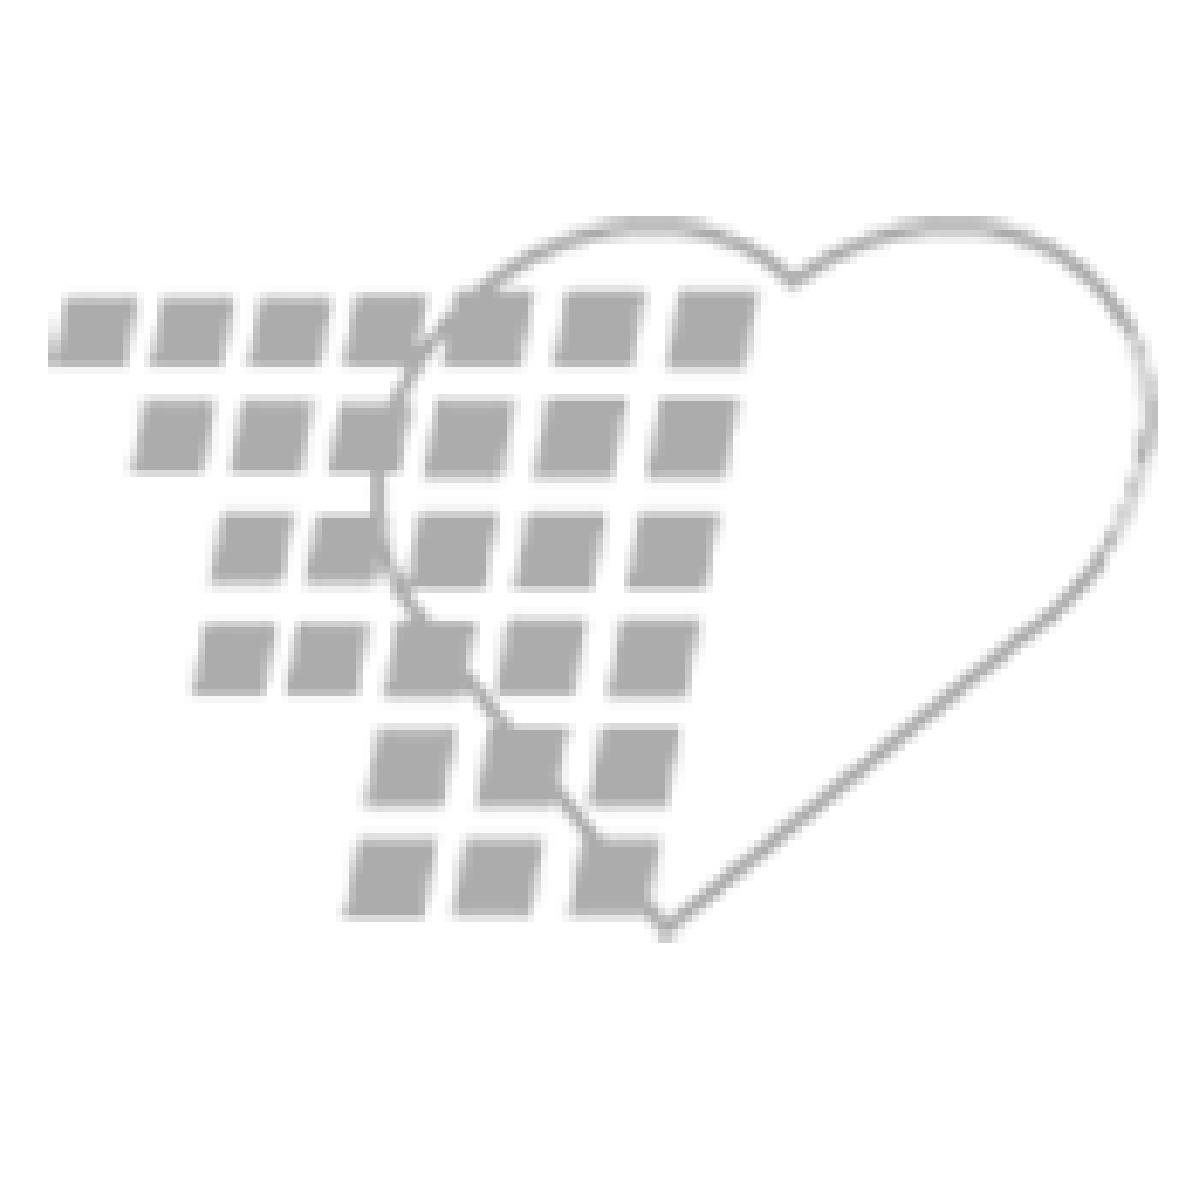 02-62-201 Incubator - Digital